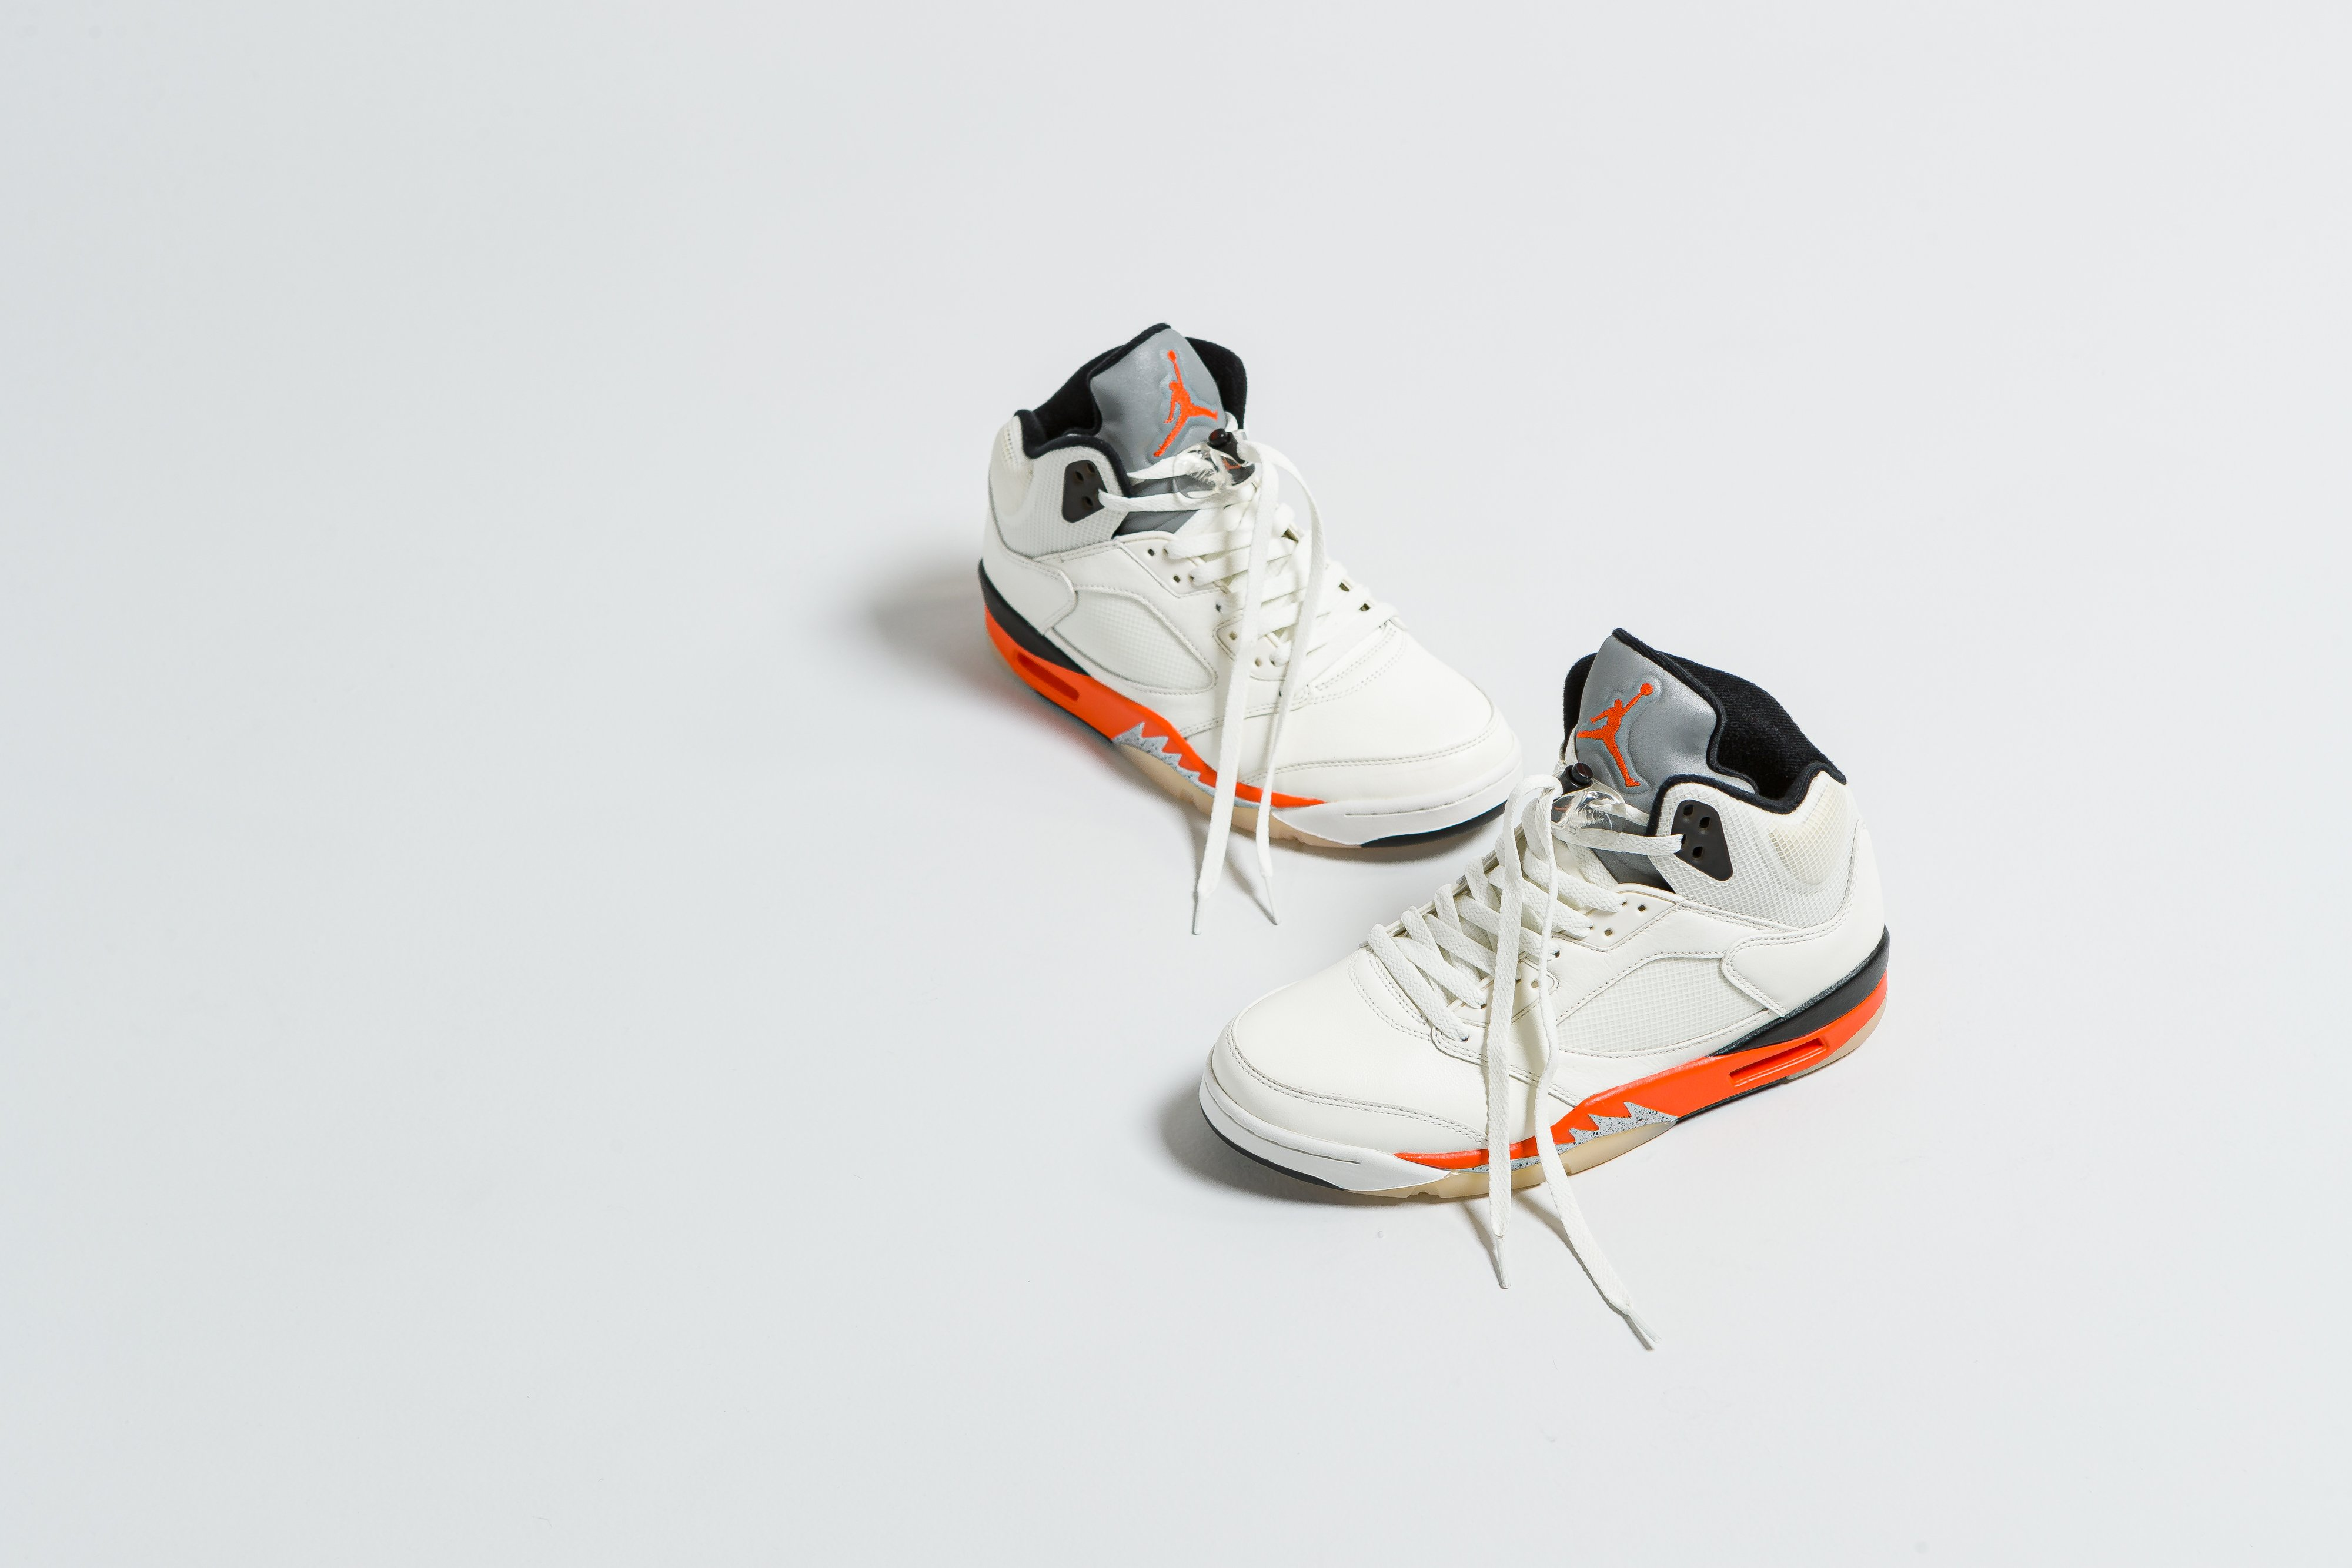 Nike - Air Jordan 5 Retro - Sail/Orange Black-Metallic Silver-Black - Up There